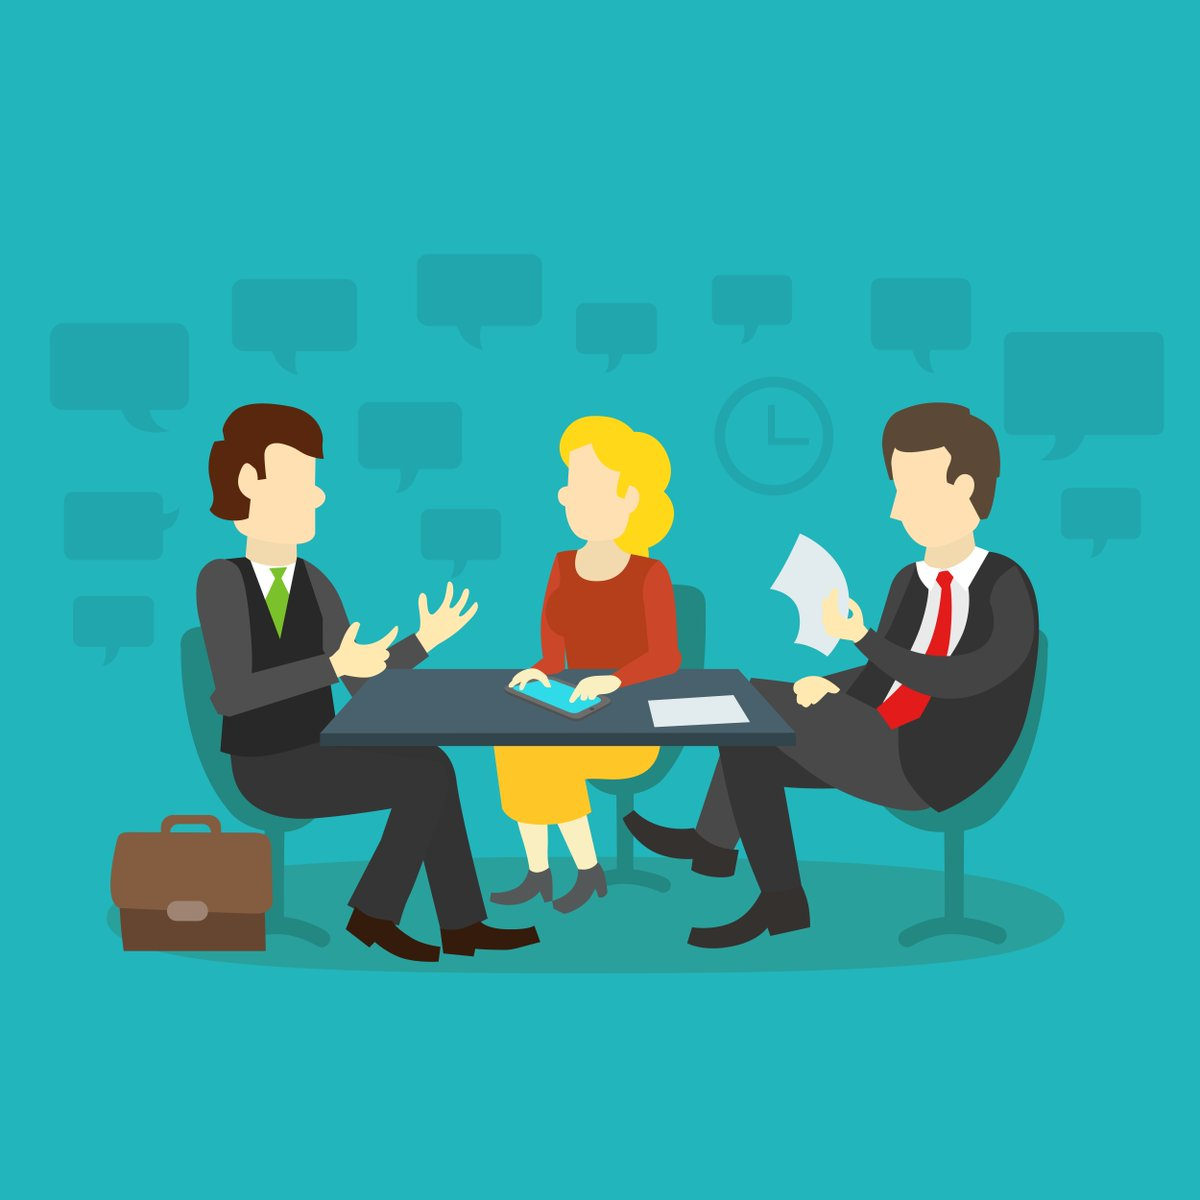 purplecv on a job interview is your chance to sell cmdslsowkaarqts jpg